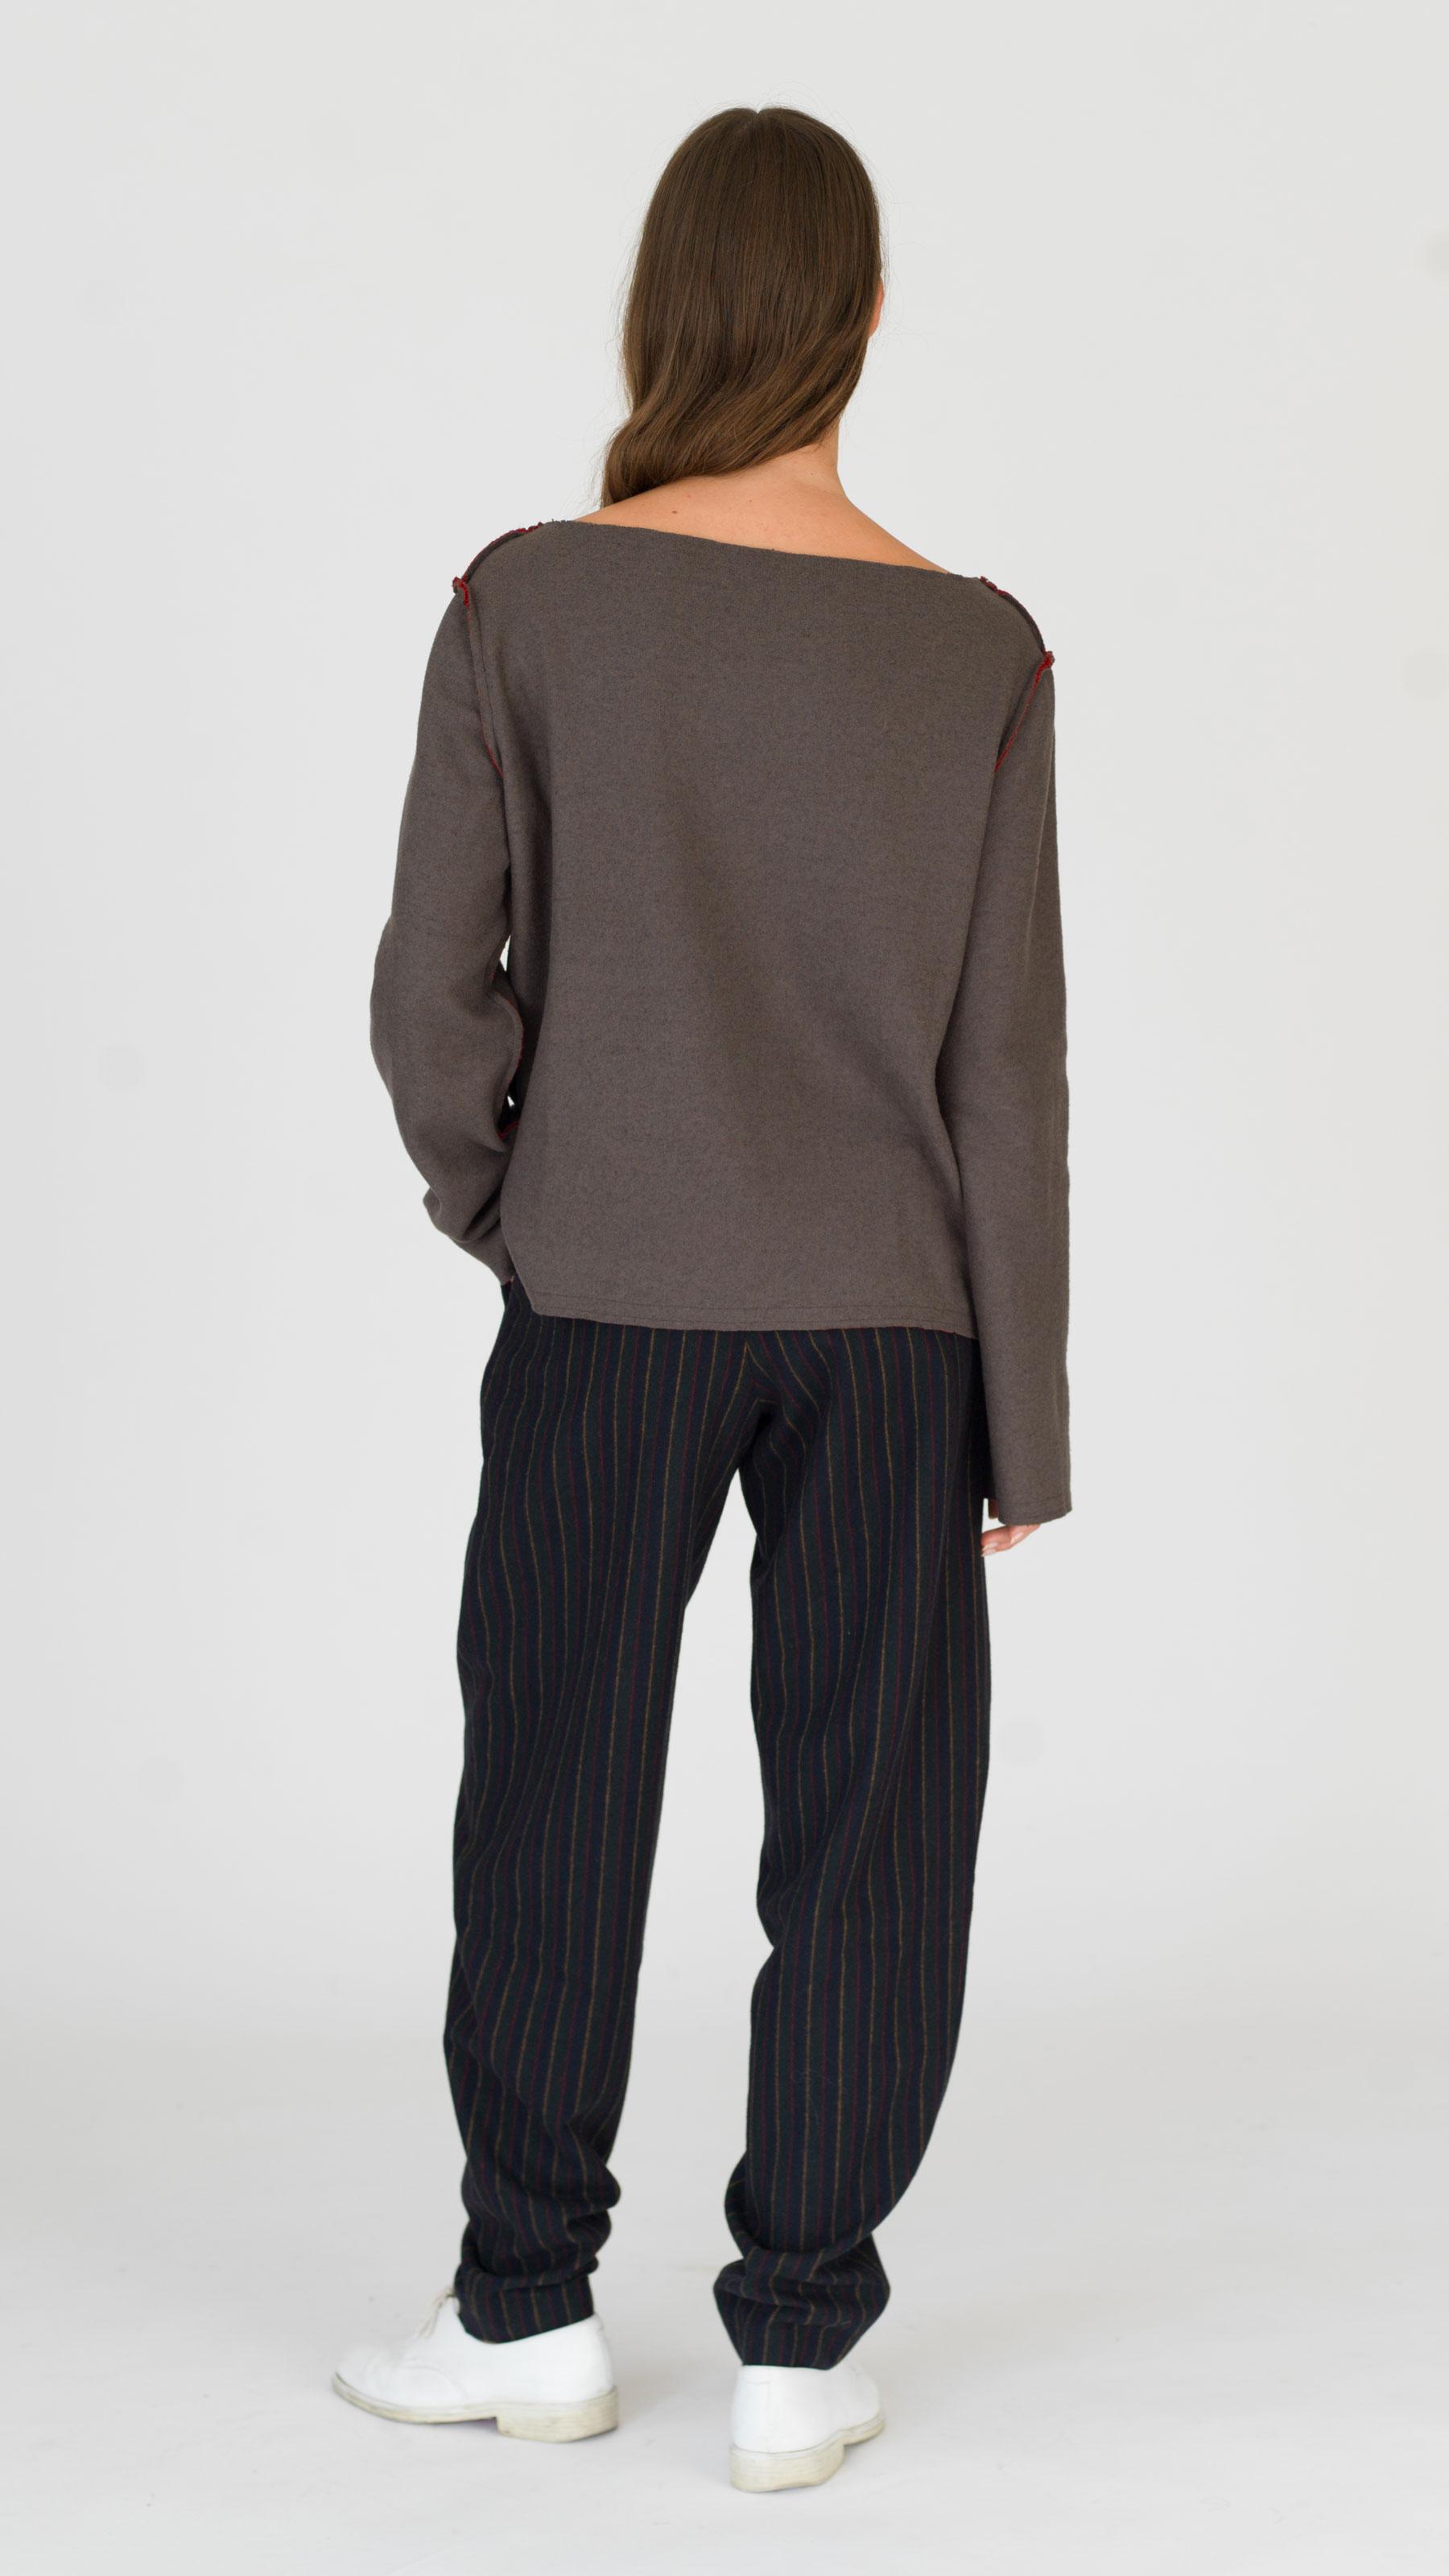 dada-diane-ducasse-pull-bateau-jersey-rouge-khaki-ah-17-dos